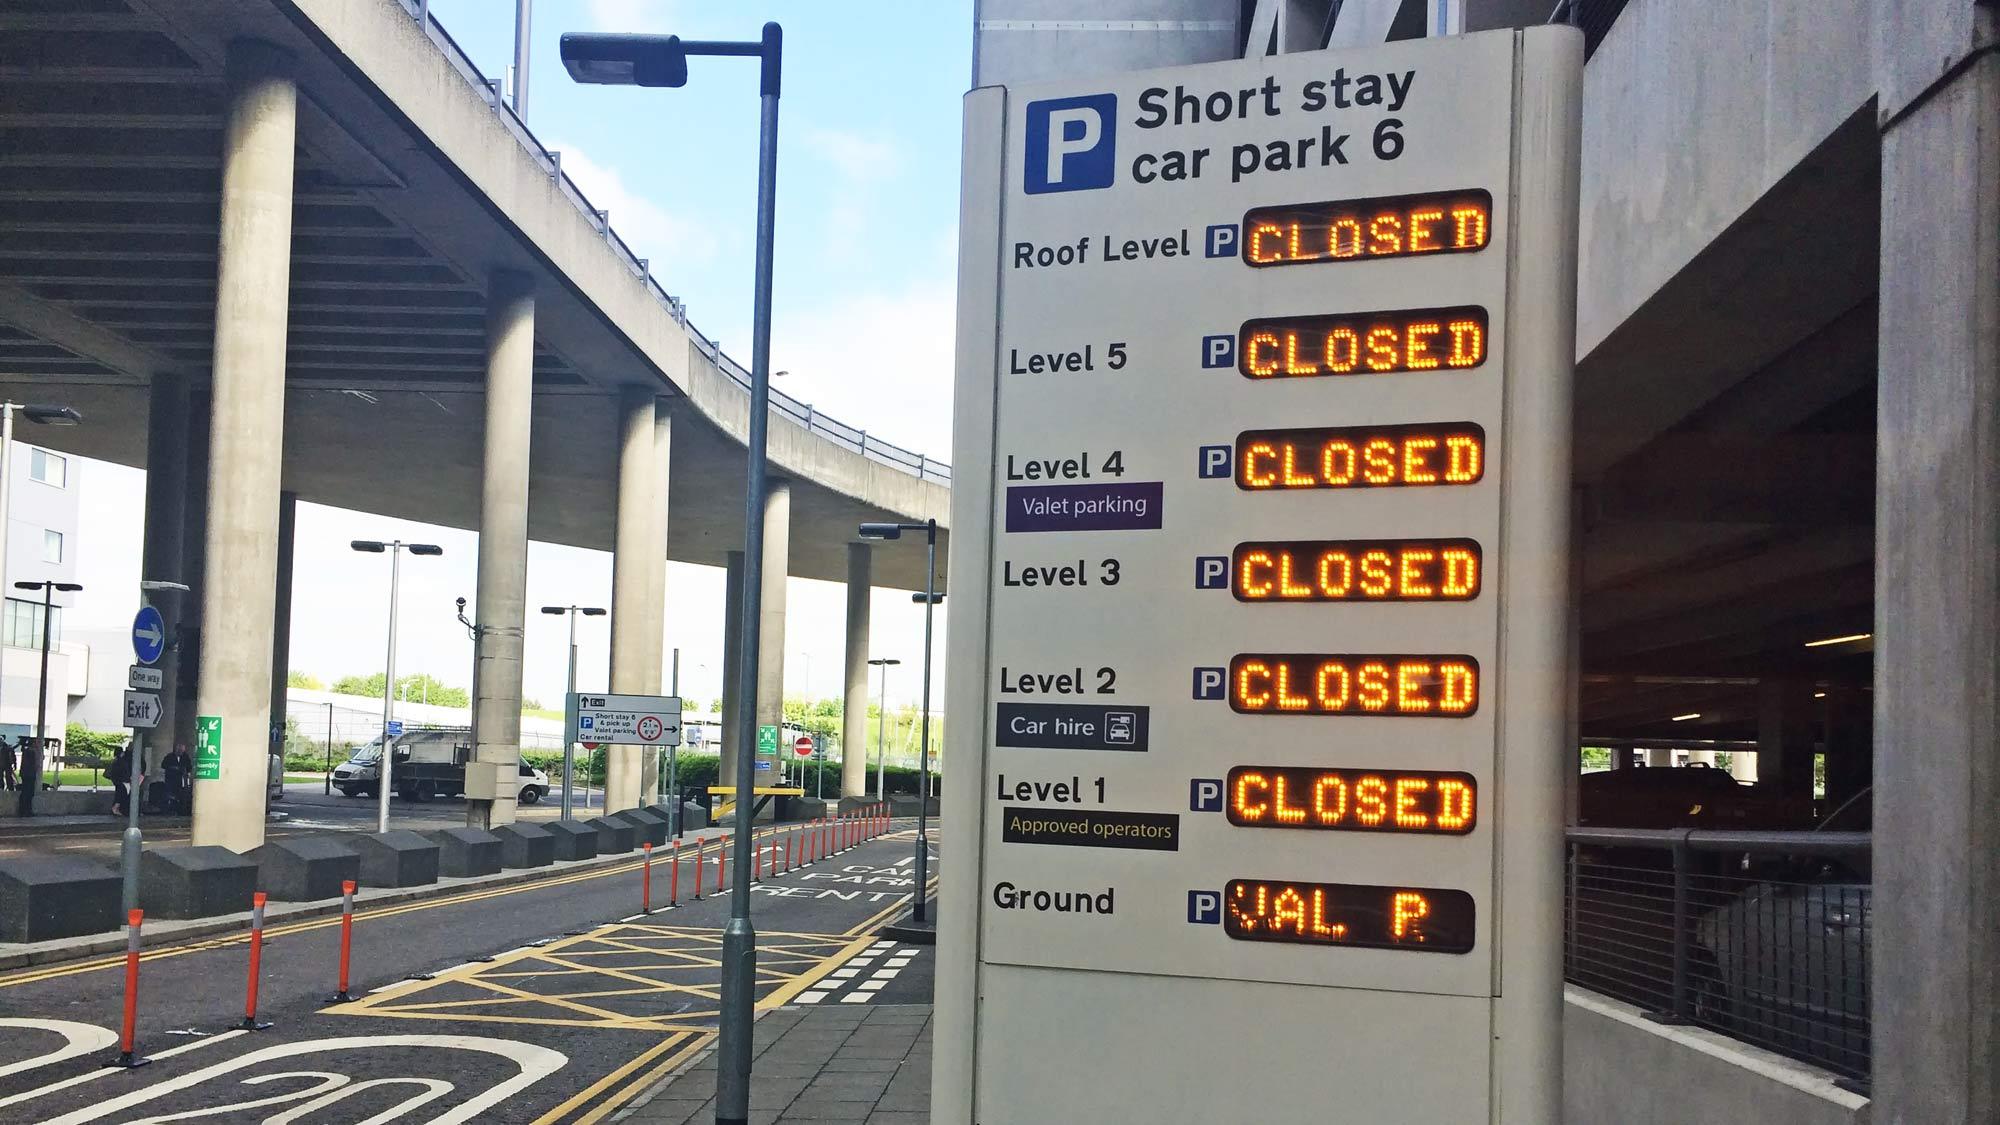 Car Park Luton Airport Promo Code